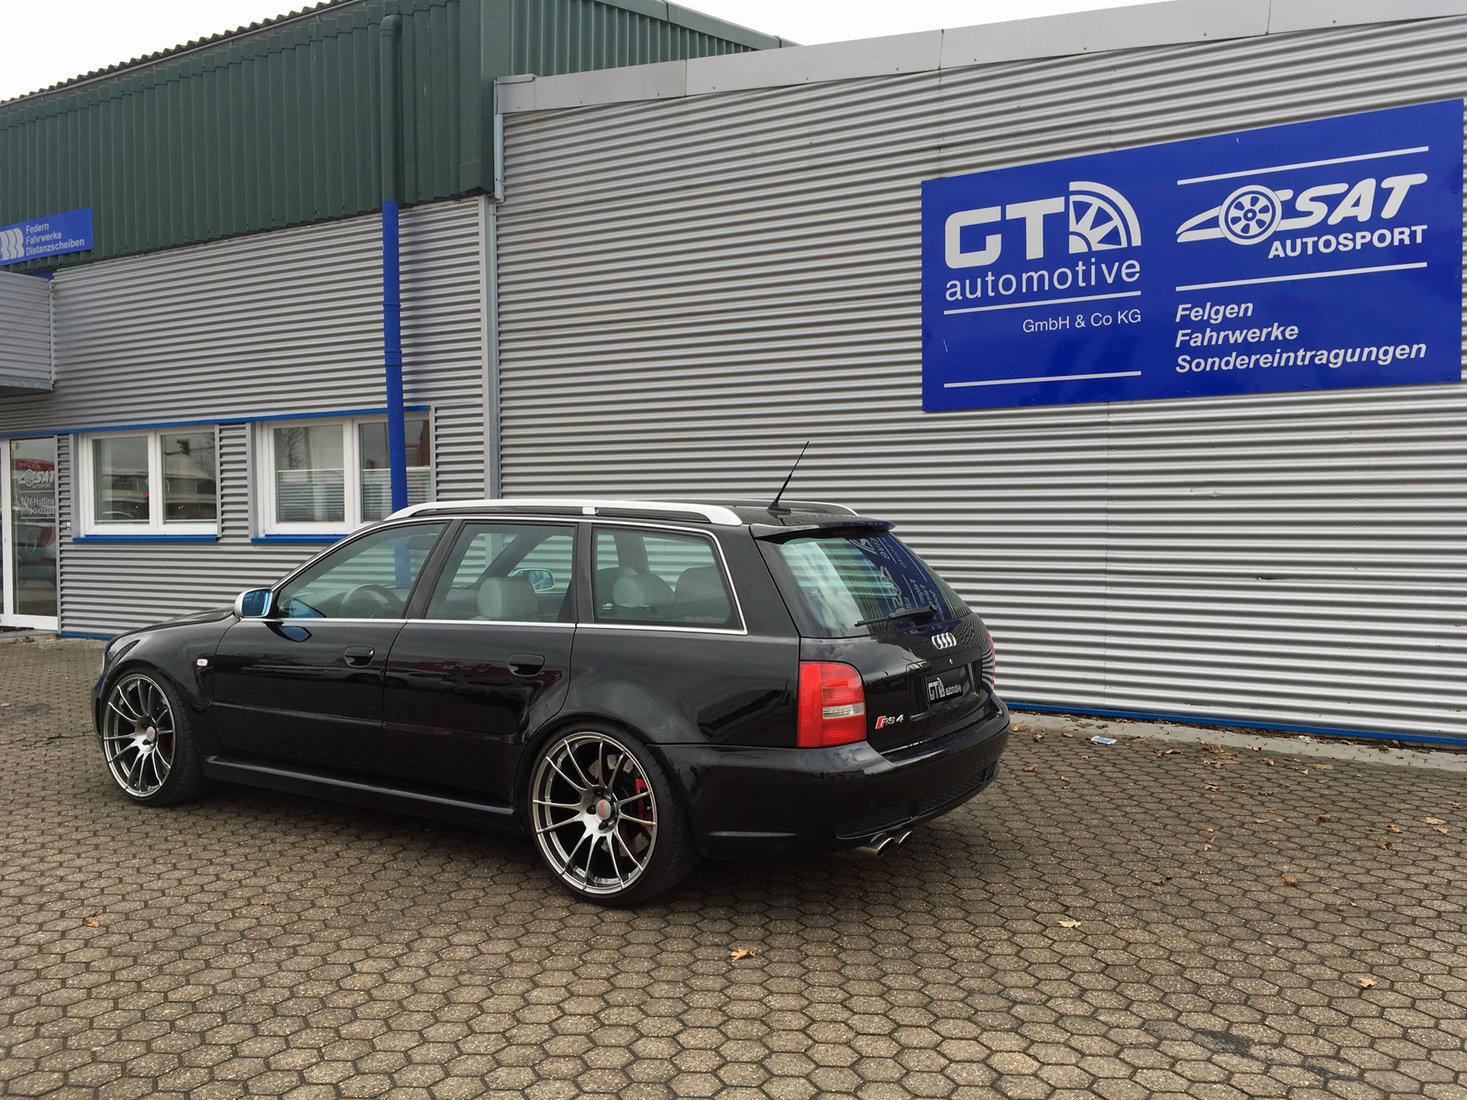 Audi A4 Avant Typ B5 Galerie By Gt Automotive Gmbh Co Kg